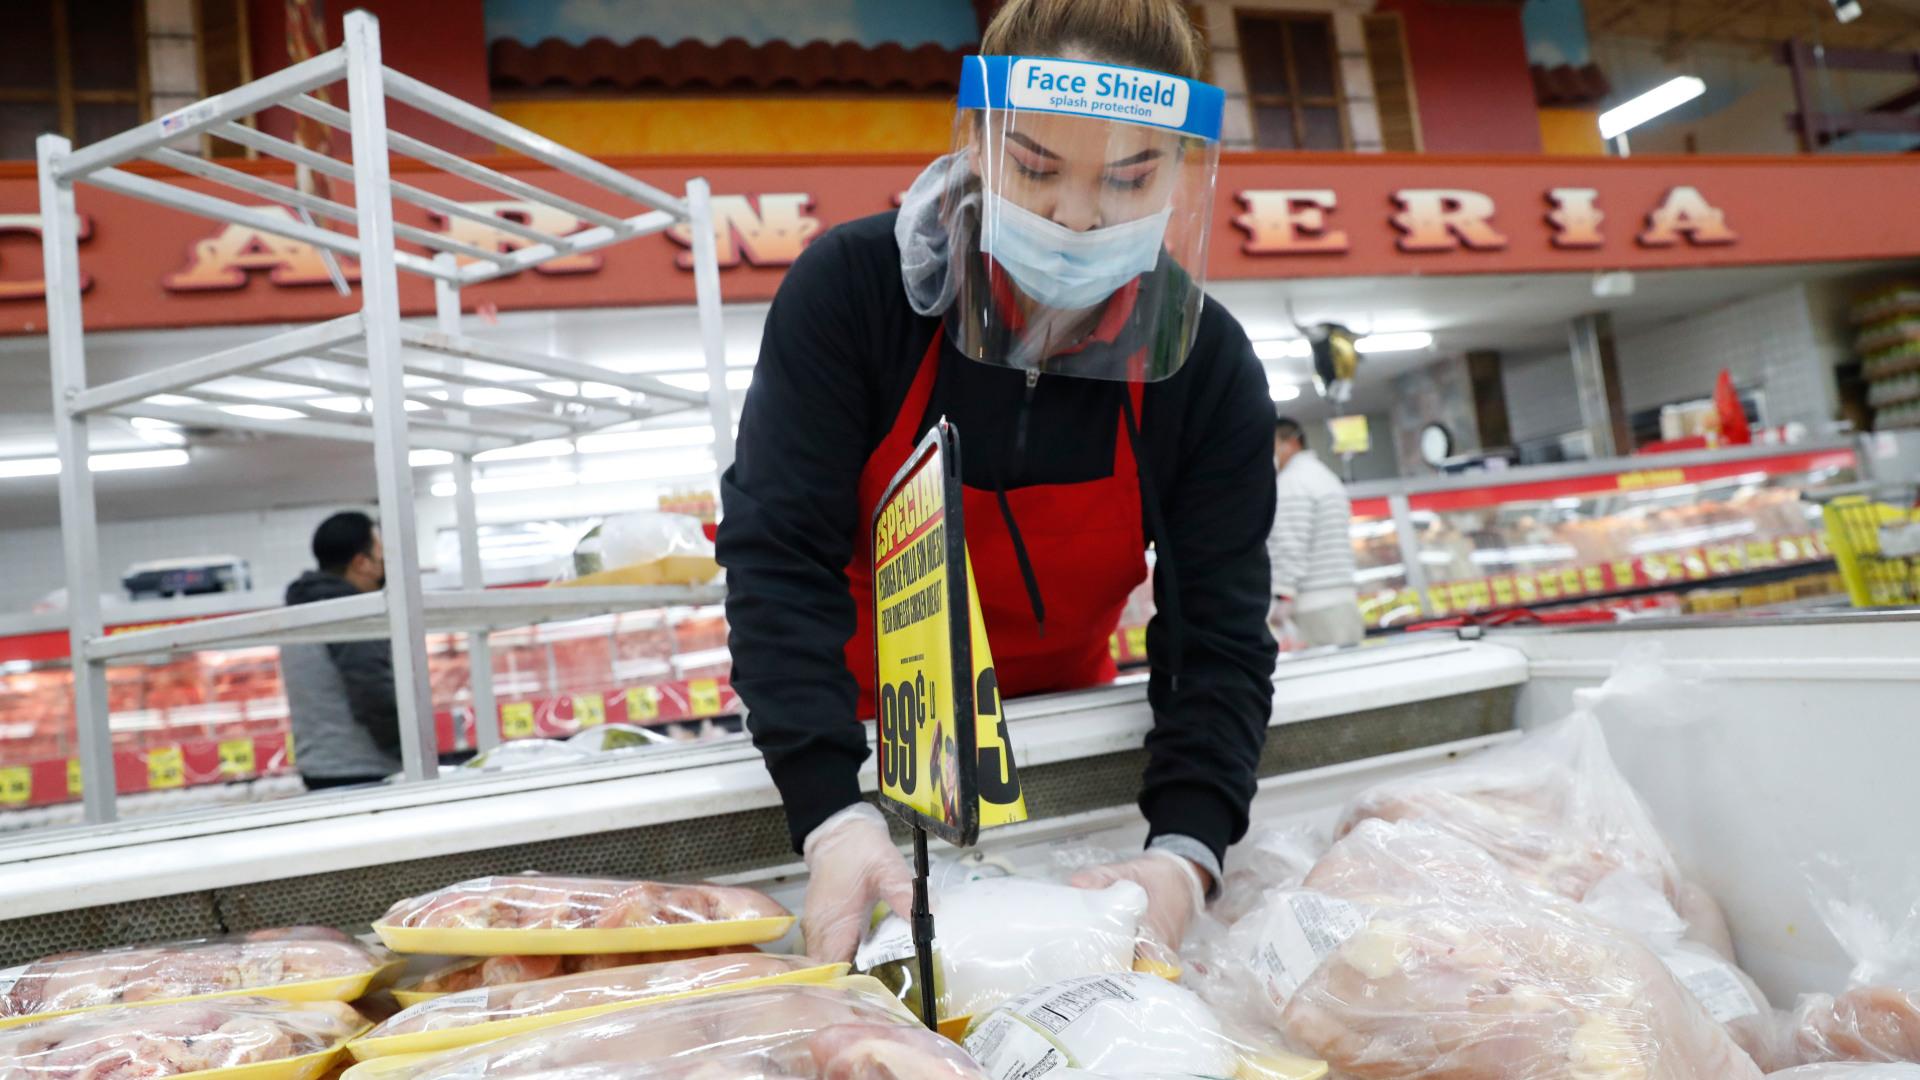 A worker stocks meat in the frozen food aisle.